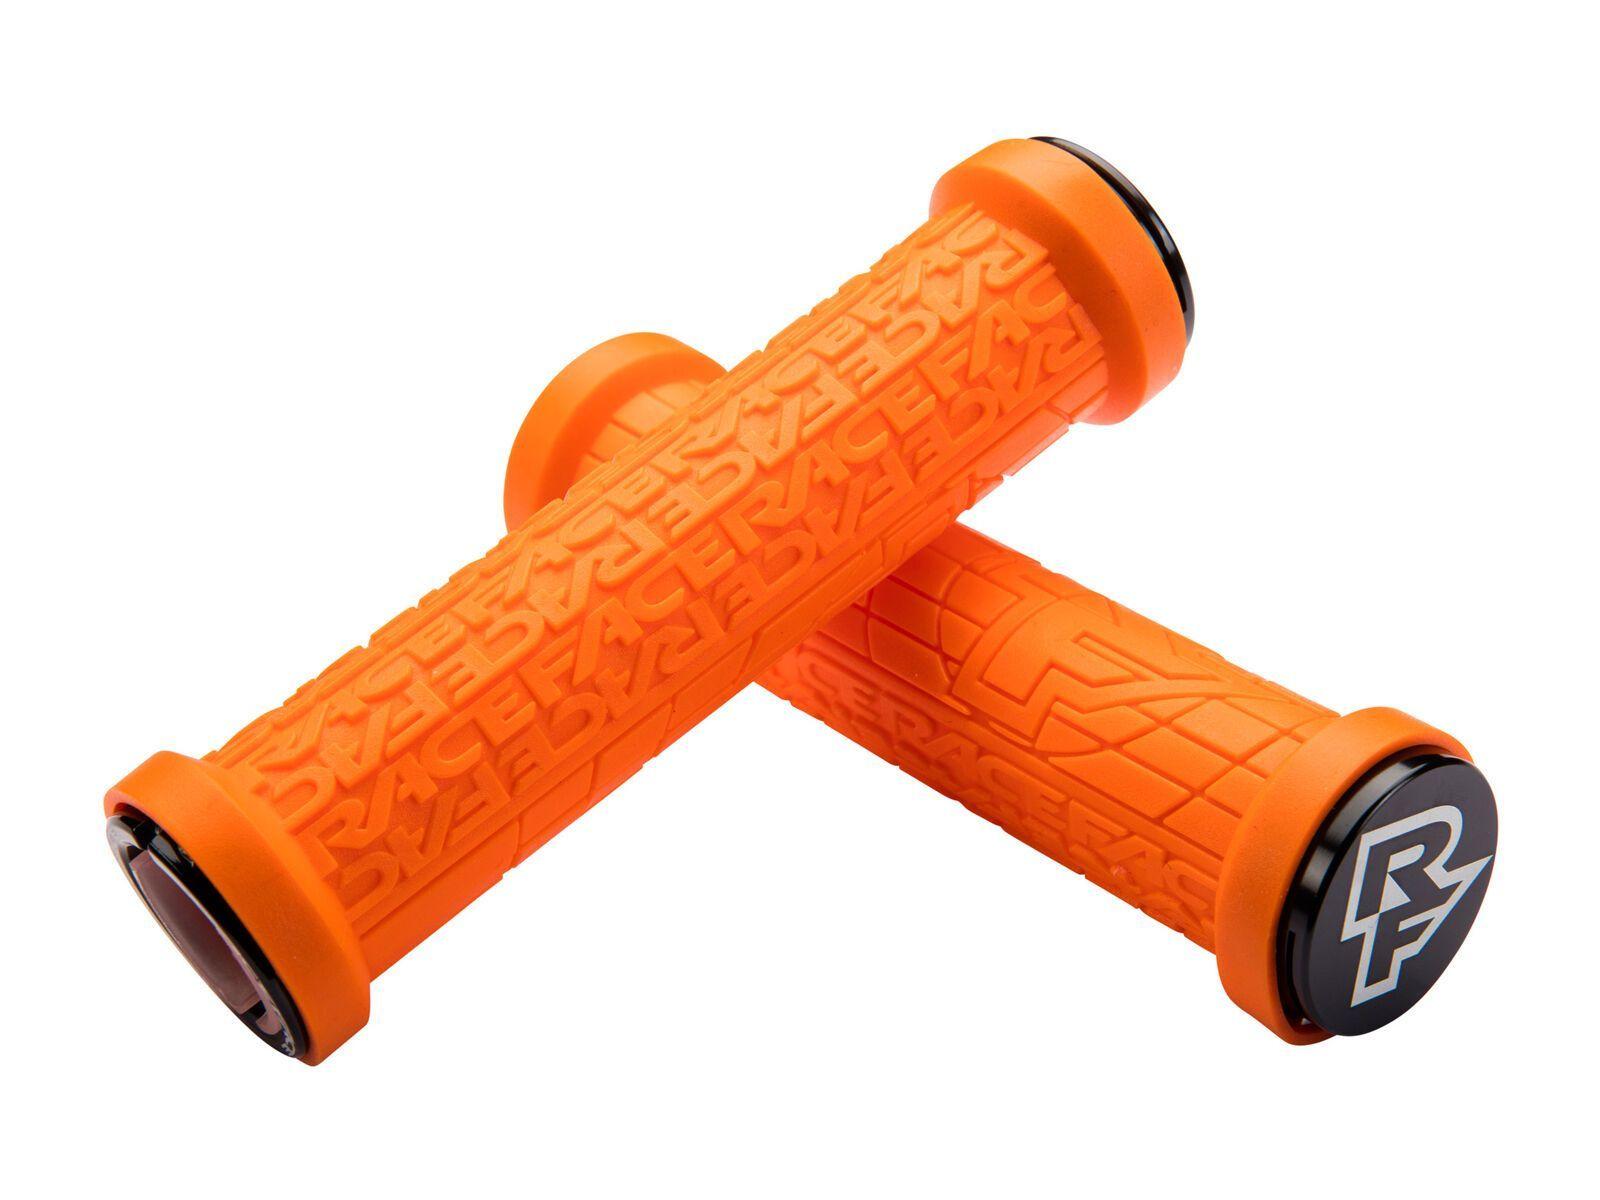 Race Face Grippler Grip - 33 mm, orange - Griffe 1973317540